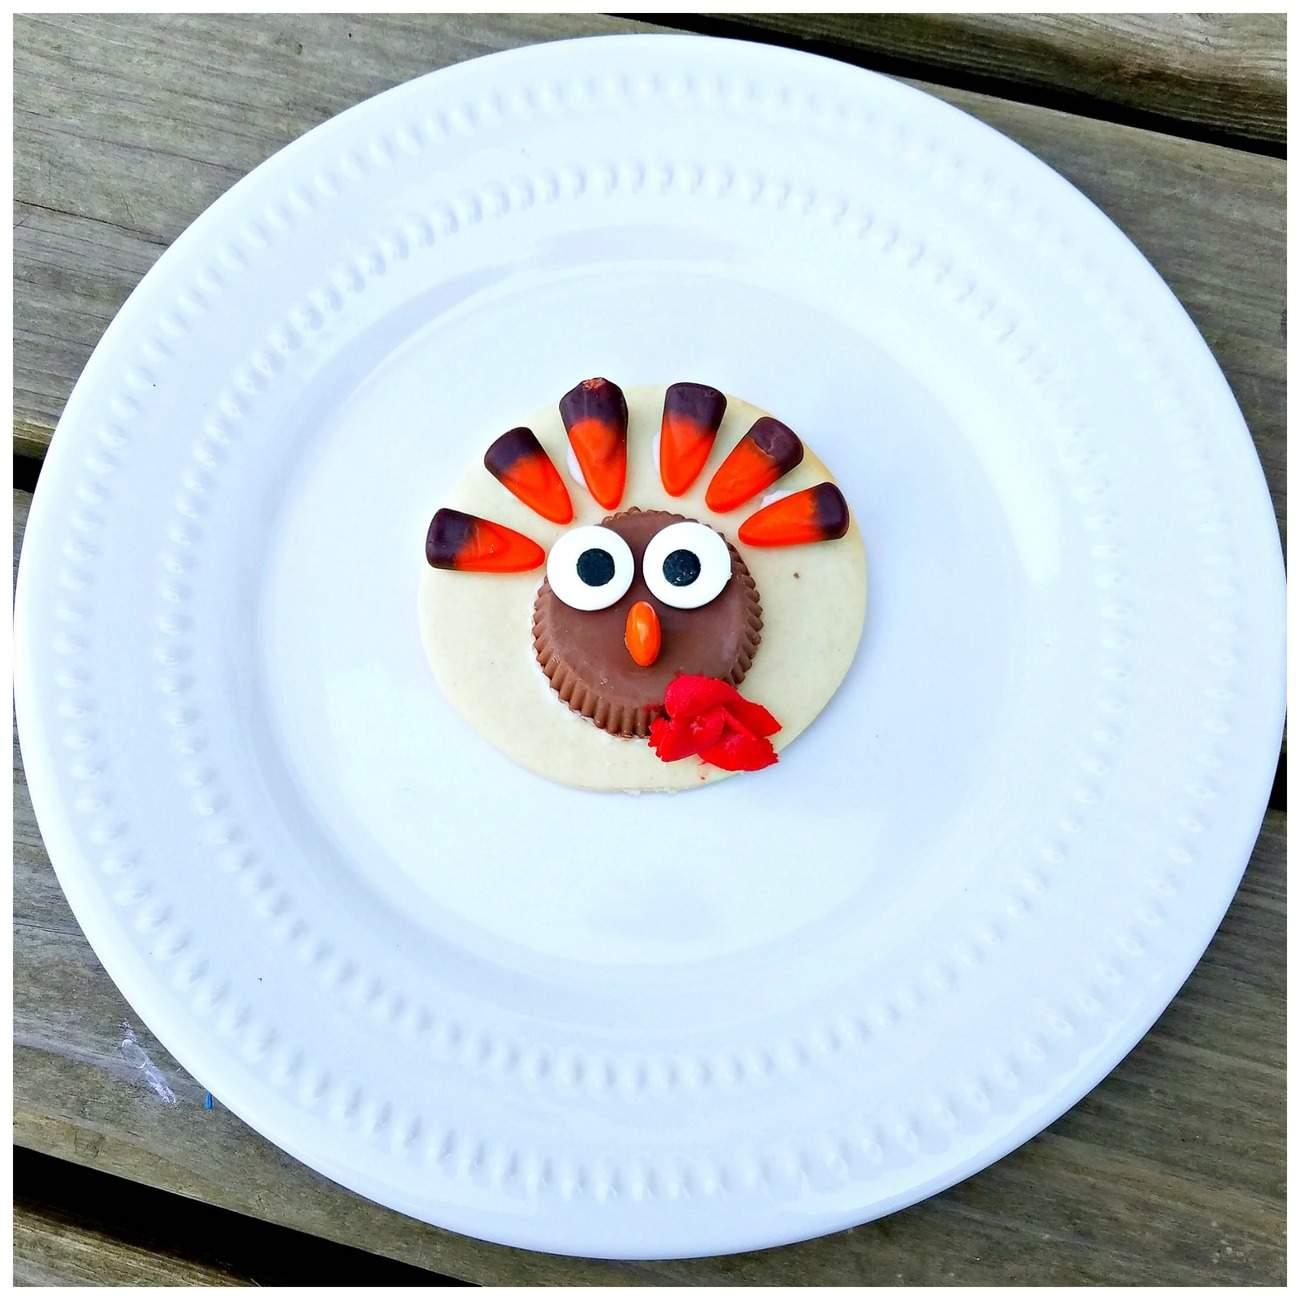 Kids in the Kitchen: How to Make Turkey Sugar Cookies